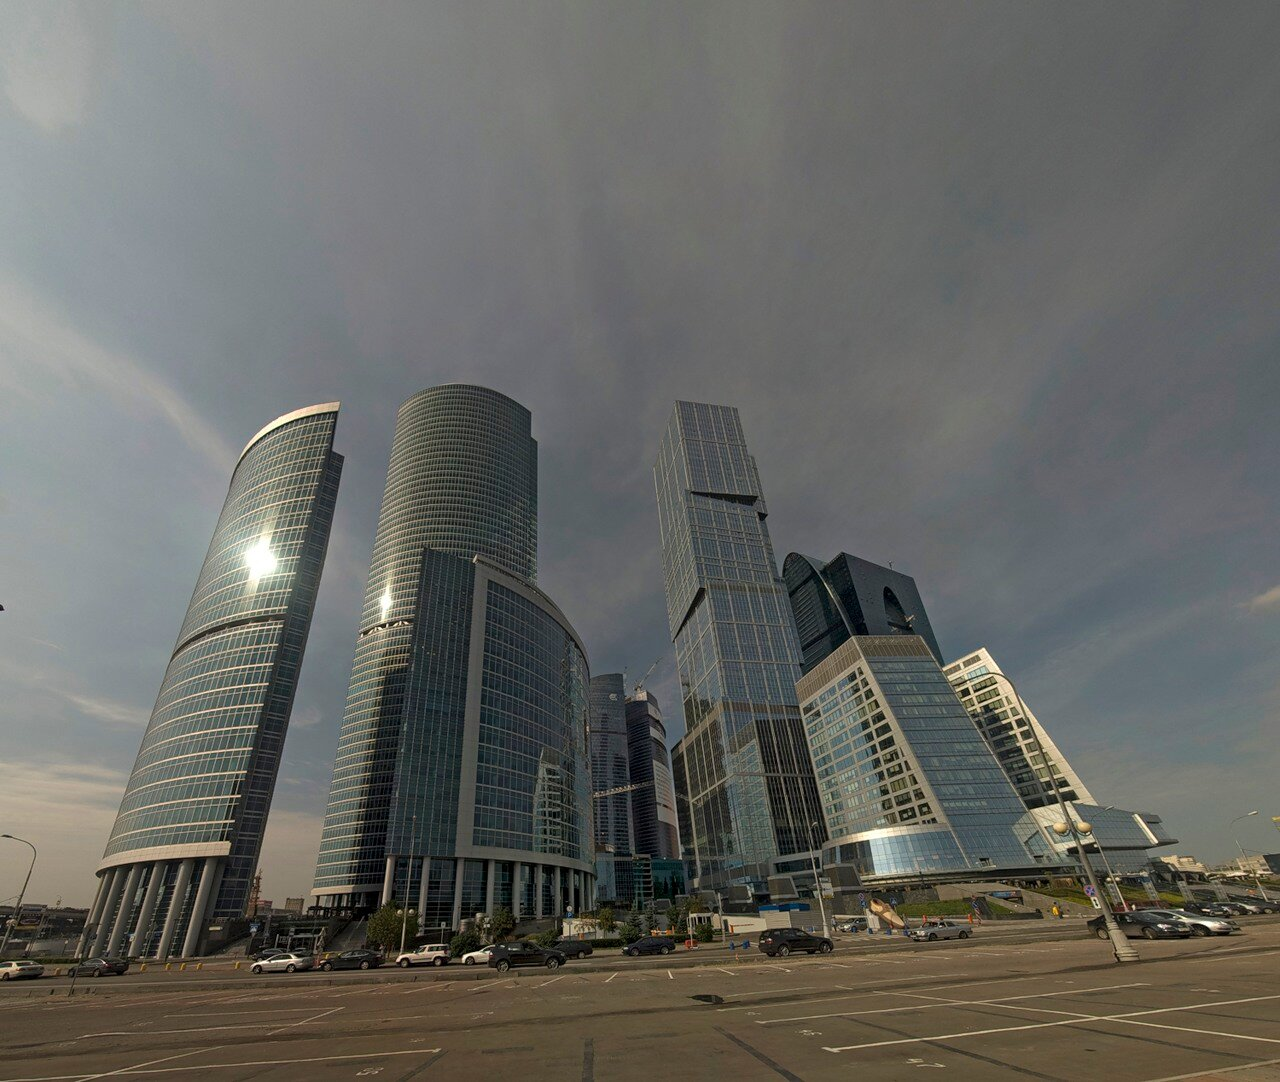 http://img-fotki.yandex.ru/get/5810/50484535.51/0_50c5c_49da989b_XXXL.jpg